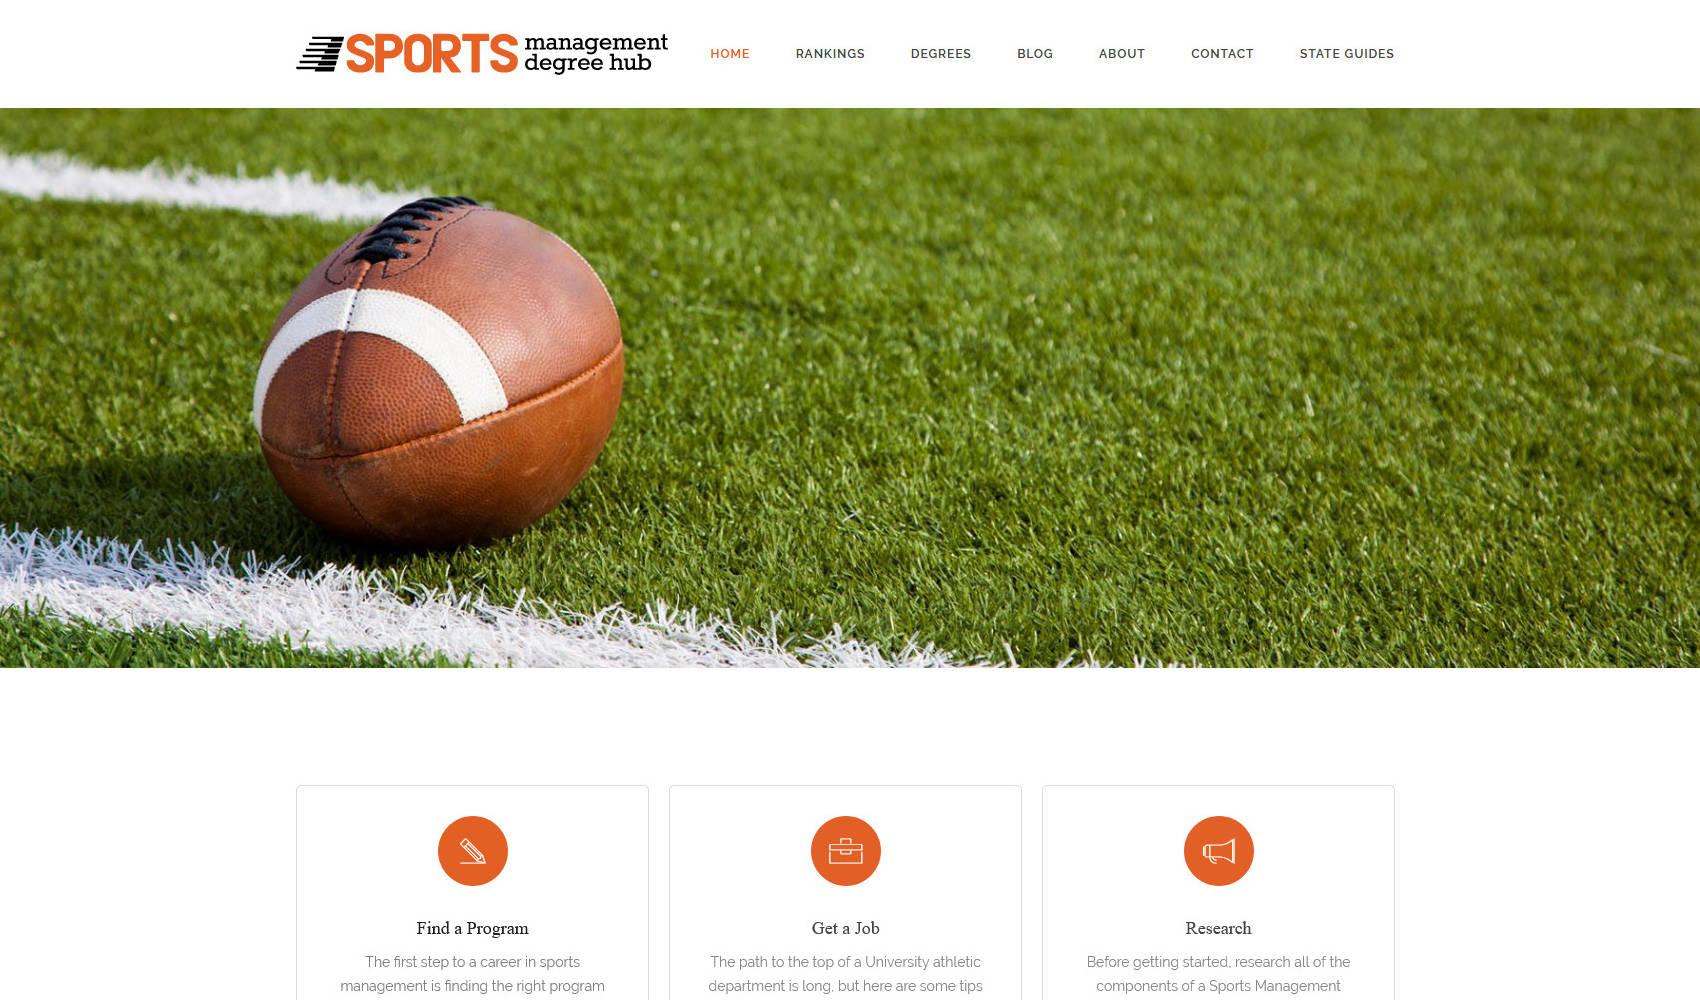 Sports Management Degree Hub